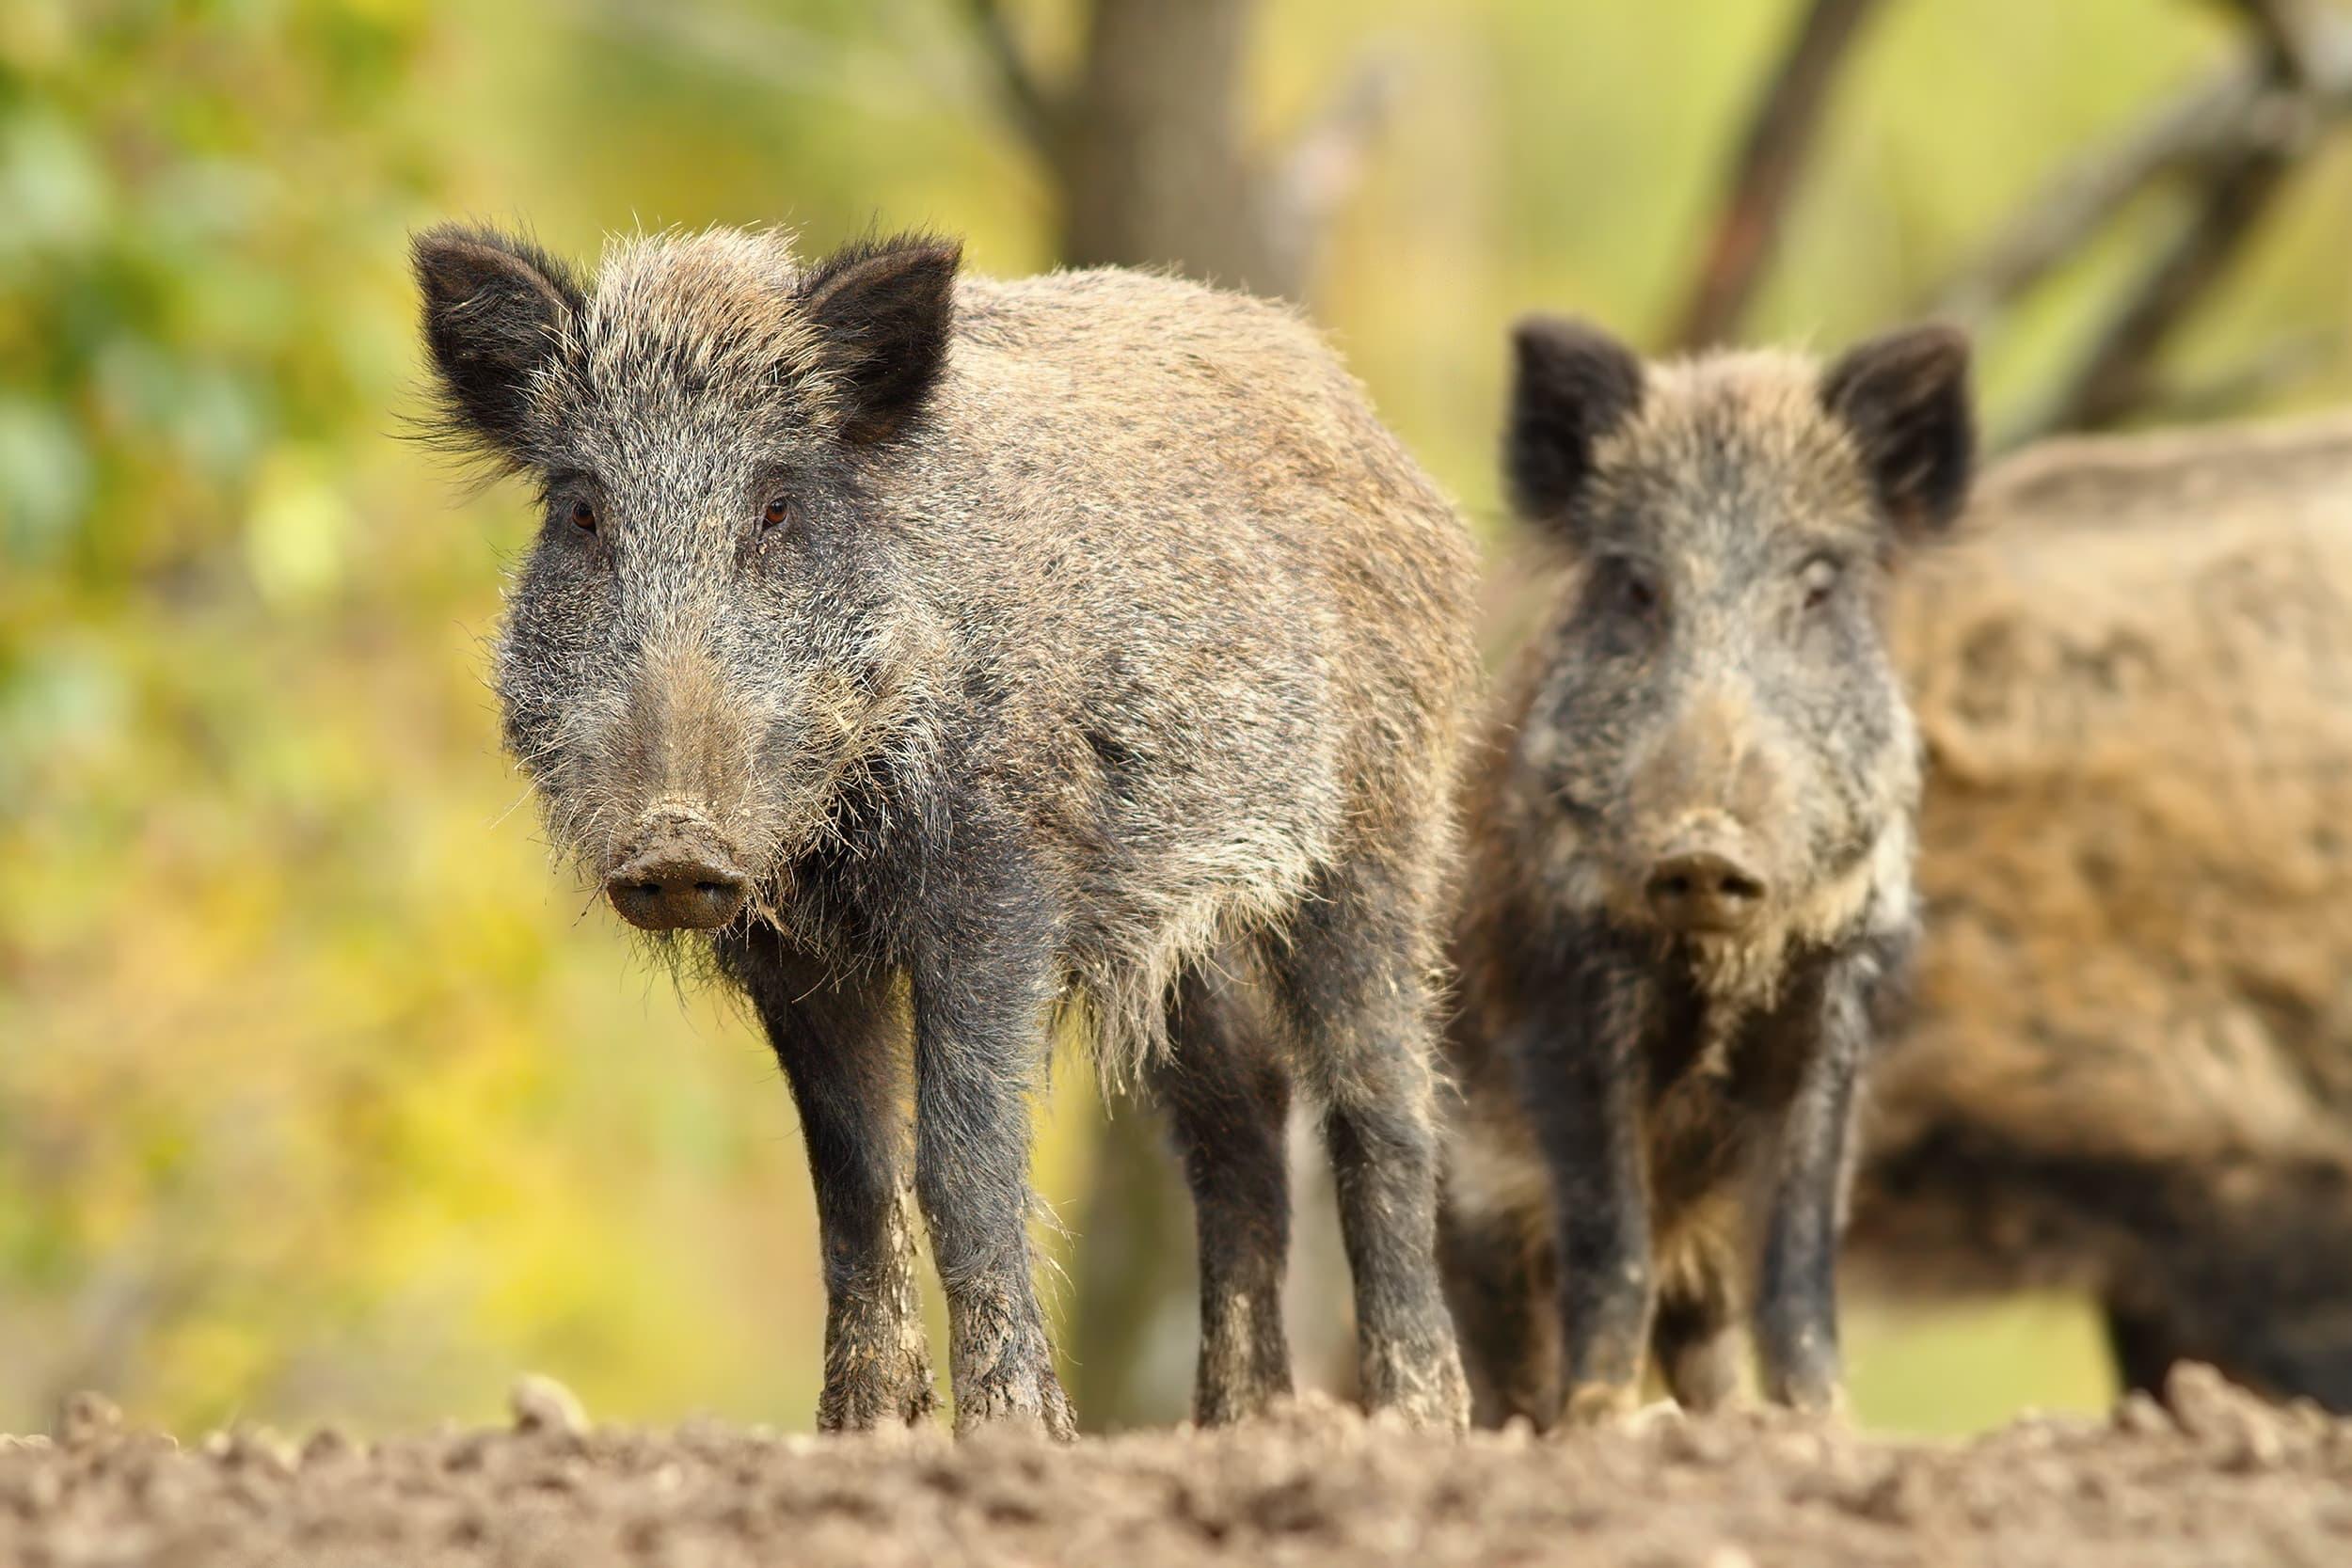 Mark Zuckerberg wears full camo to hunt wild boar on Hawaii